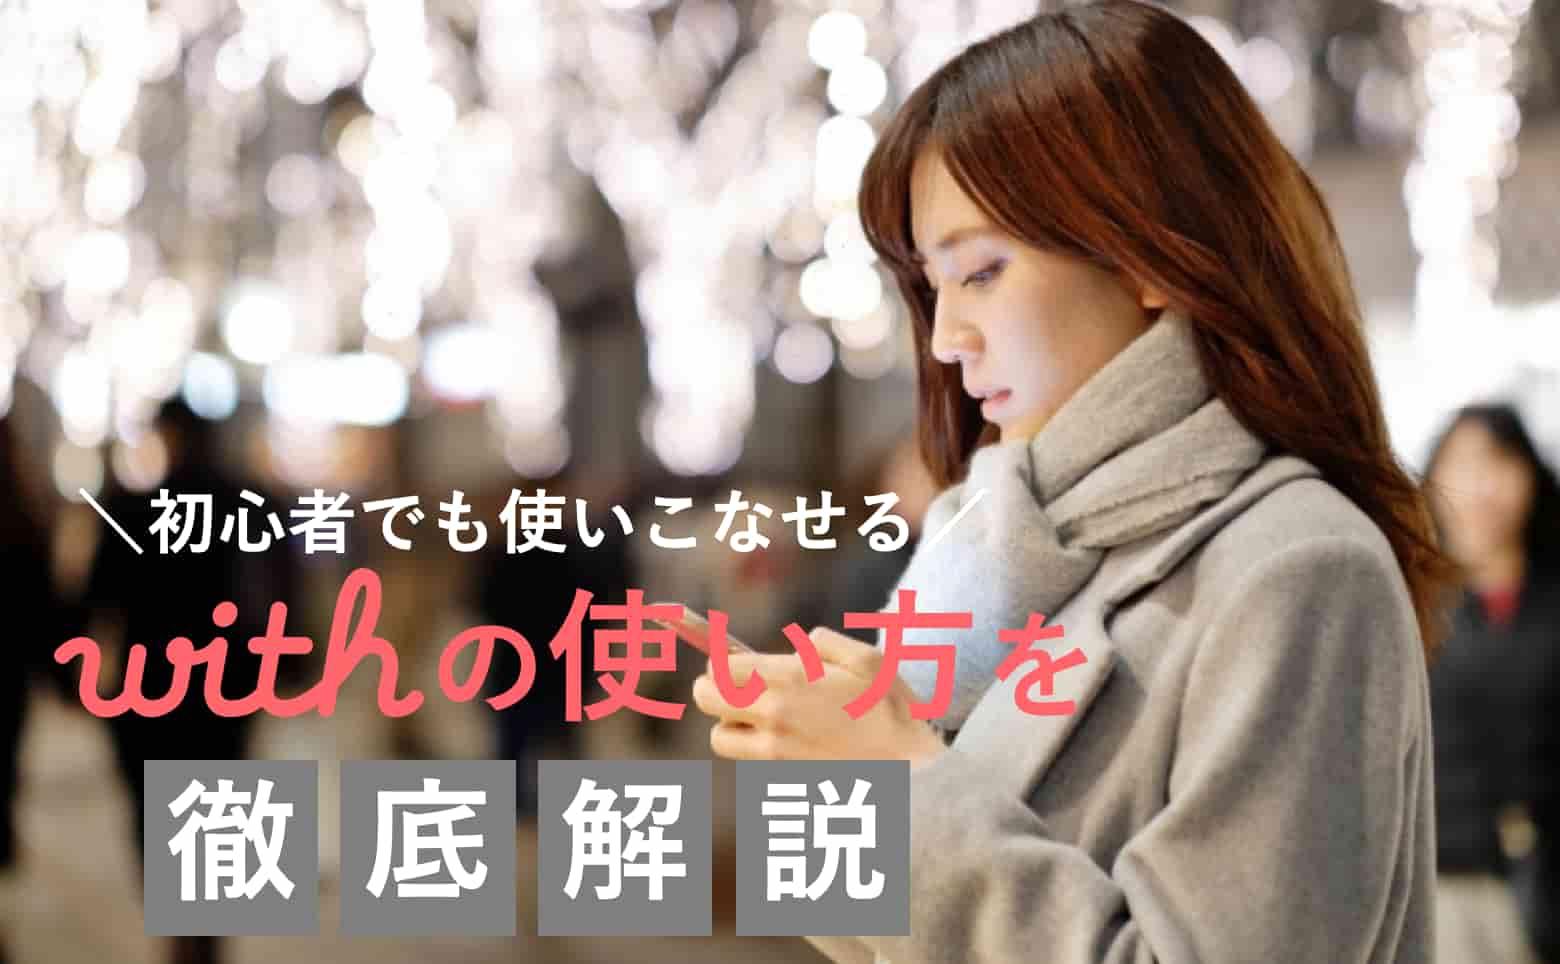 with使い方アイキャッチ